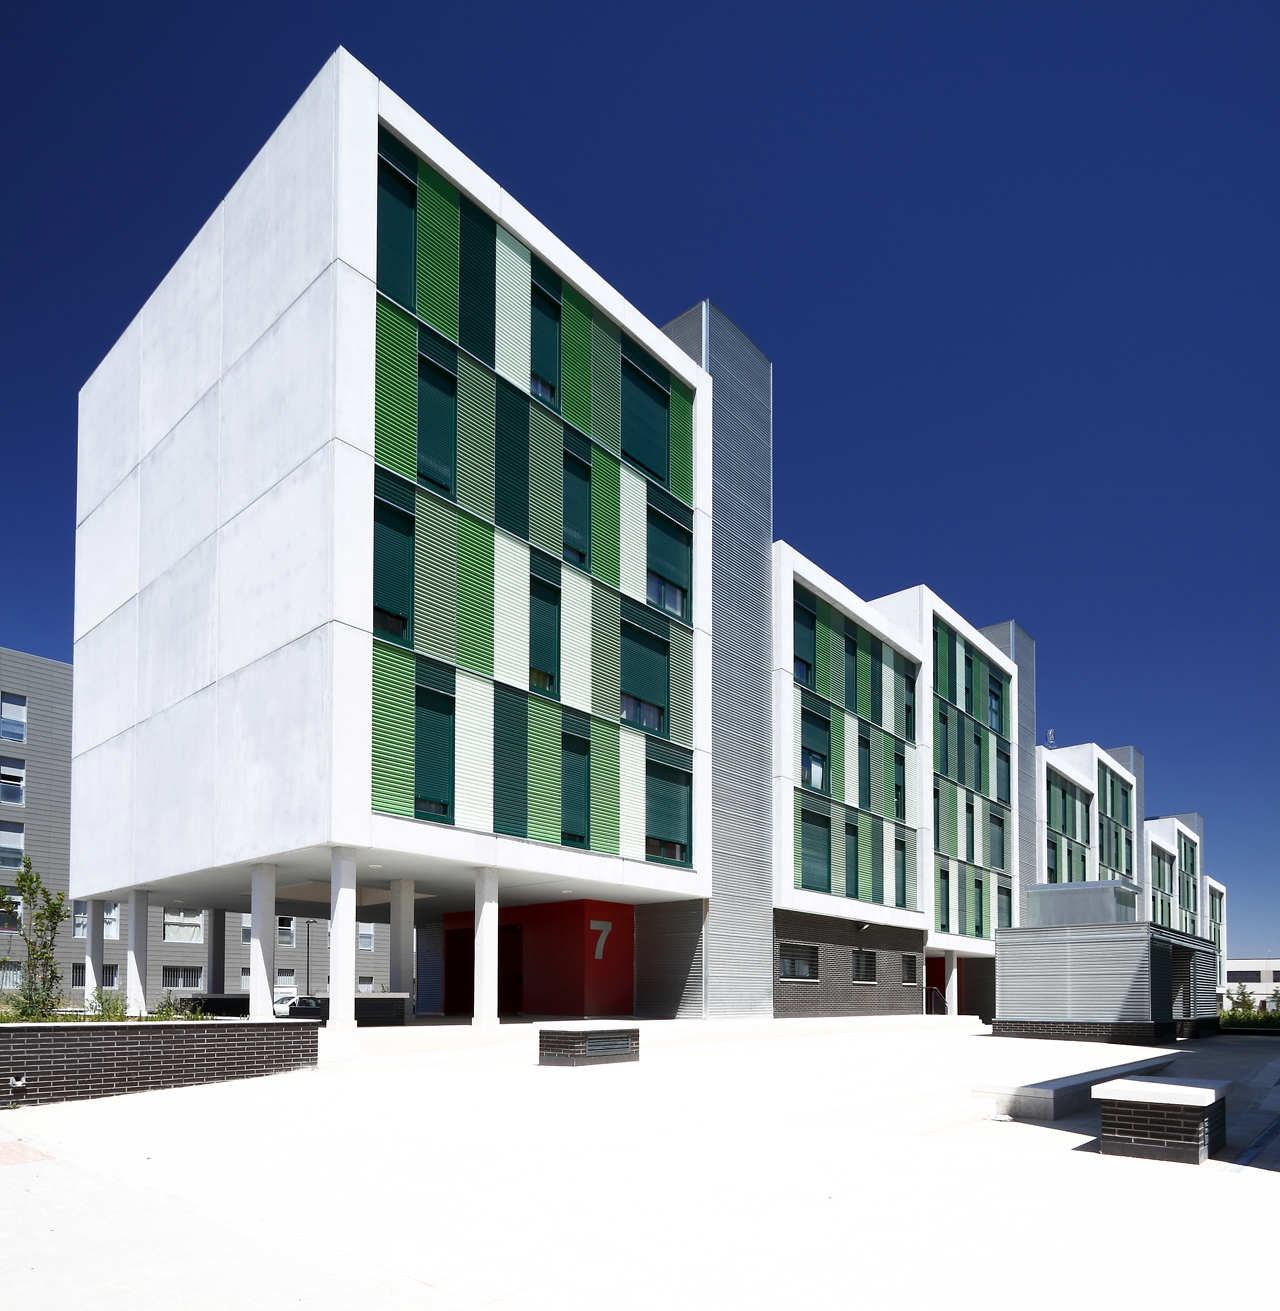 120 Social Housing In Parla / Arquitecnica, © Aitor Estevez Olaizola